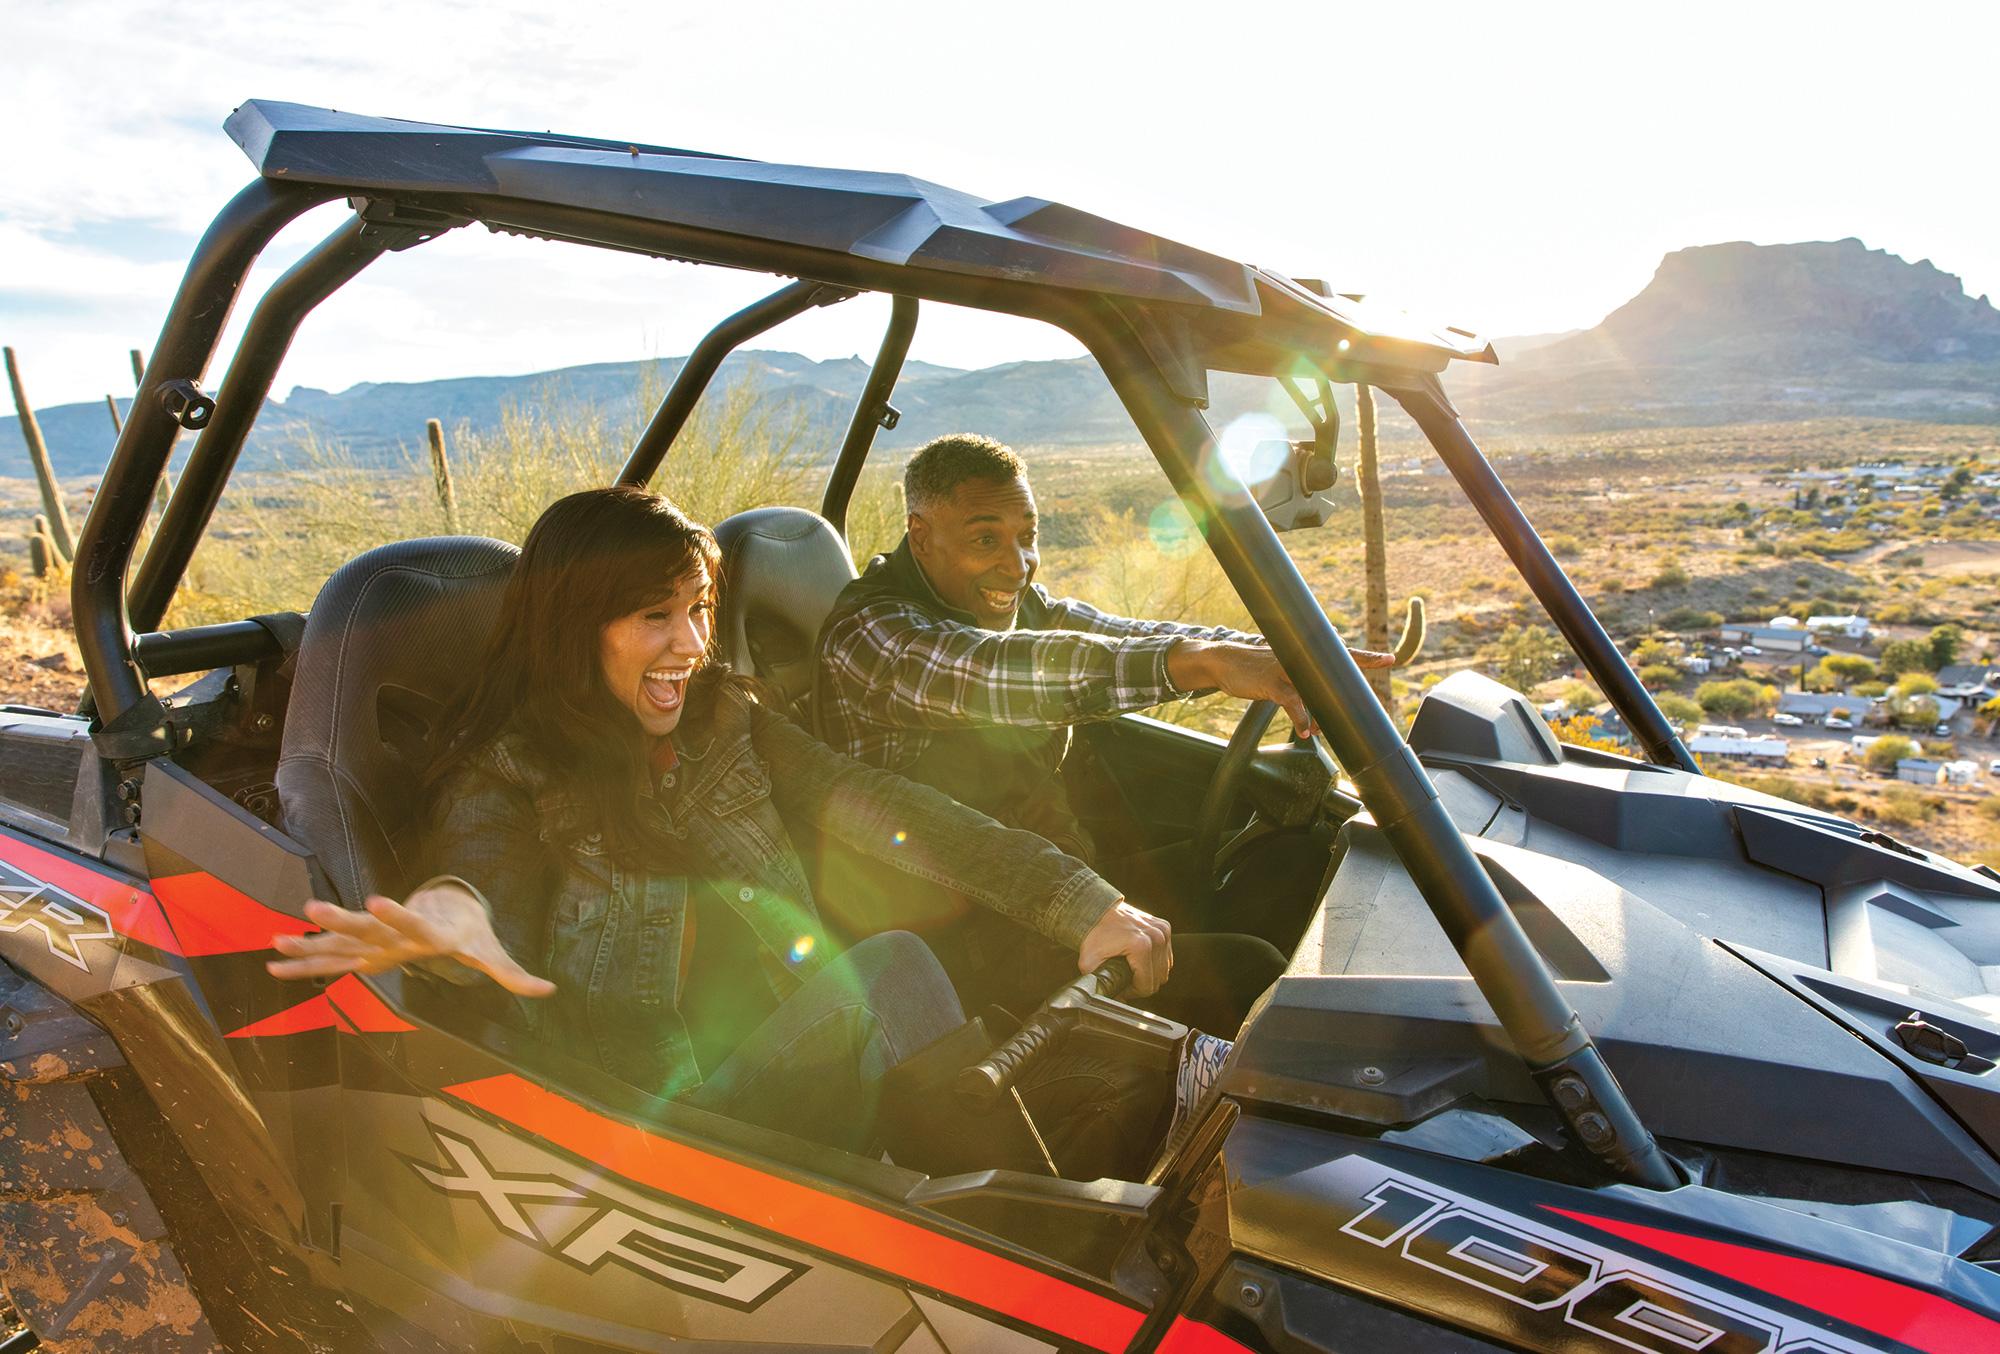 UTV thrills looking over Box 8 Ranch; Photo by Kevin Kaminski; Models: Lauren Alonzo & Russell Scott/Ford Robert Black Agency